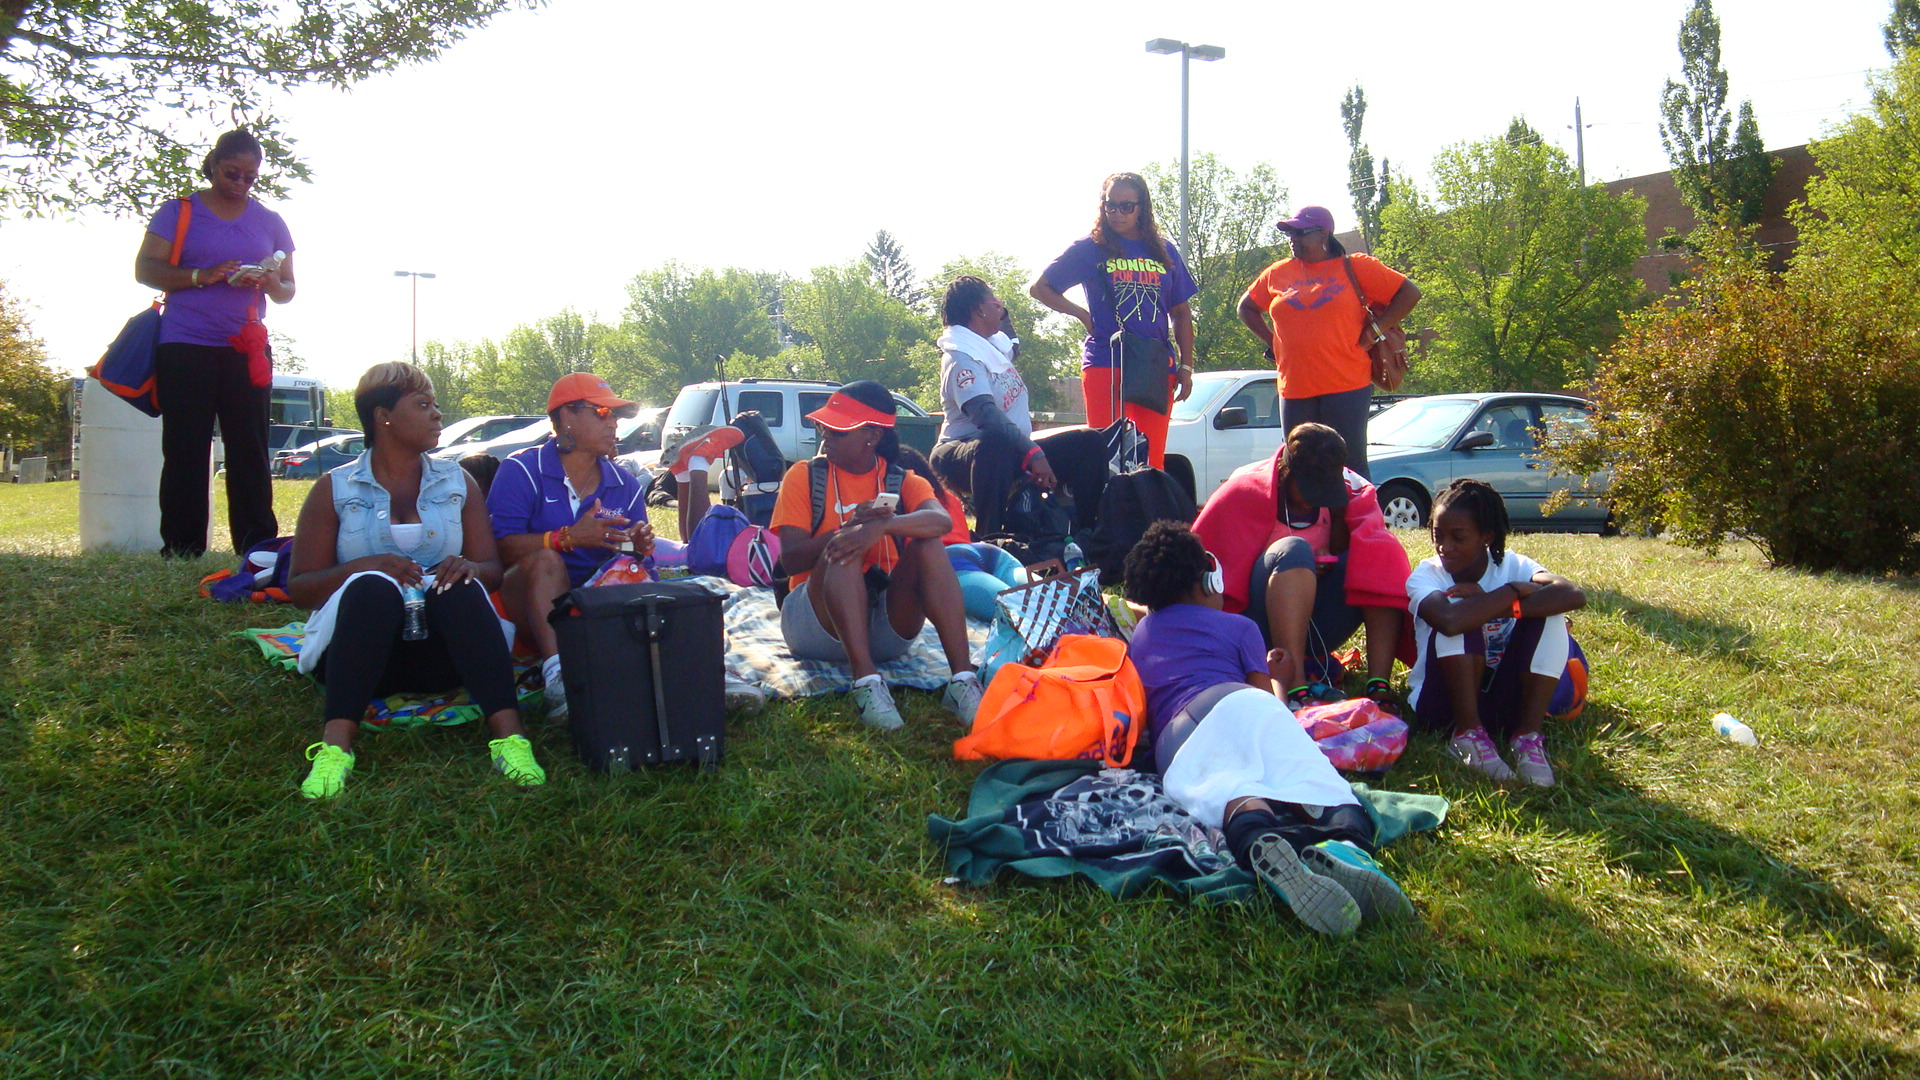 Sonics camp outside the stadium